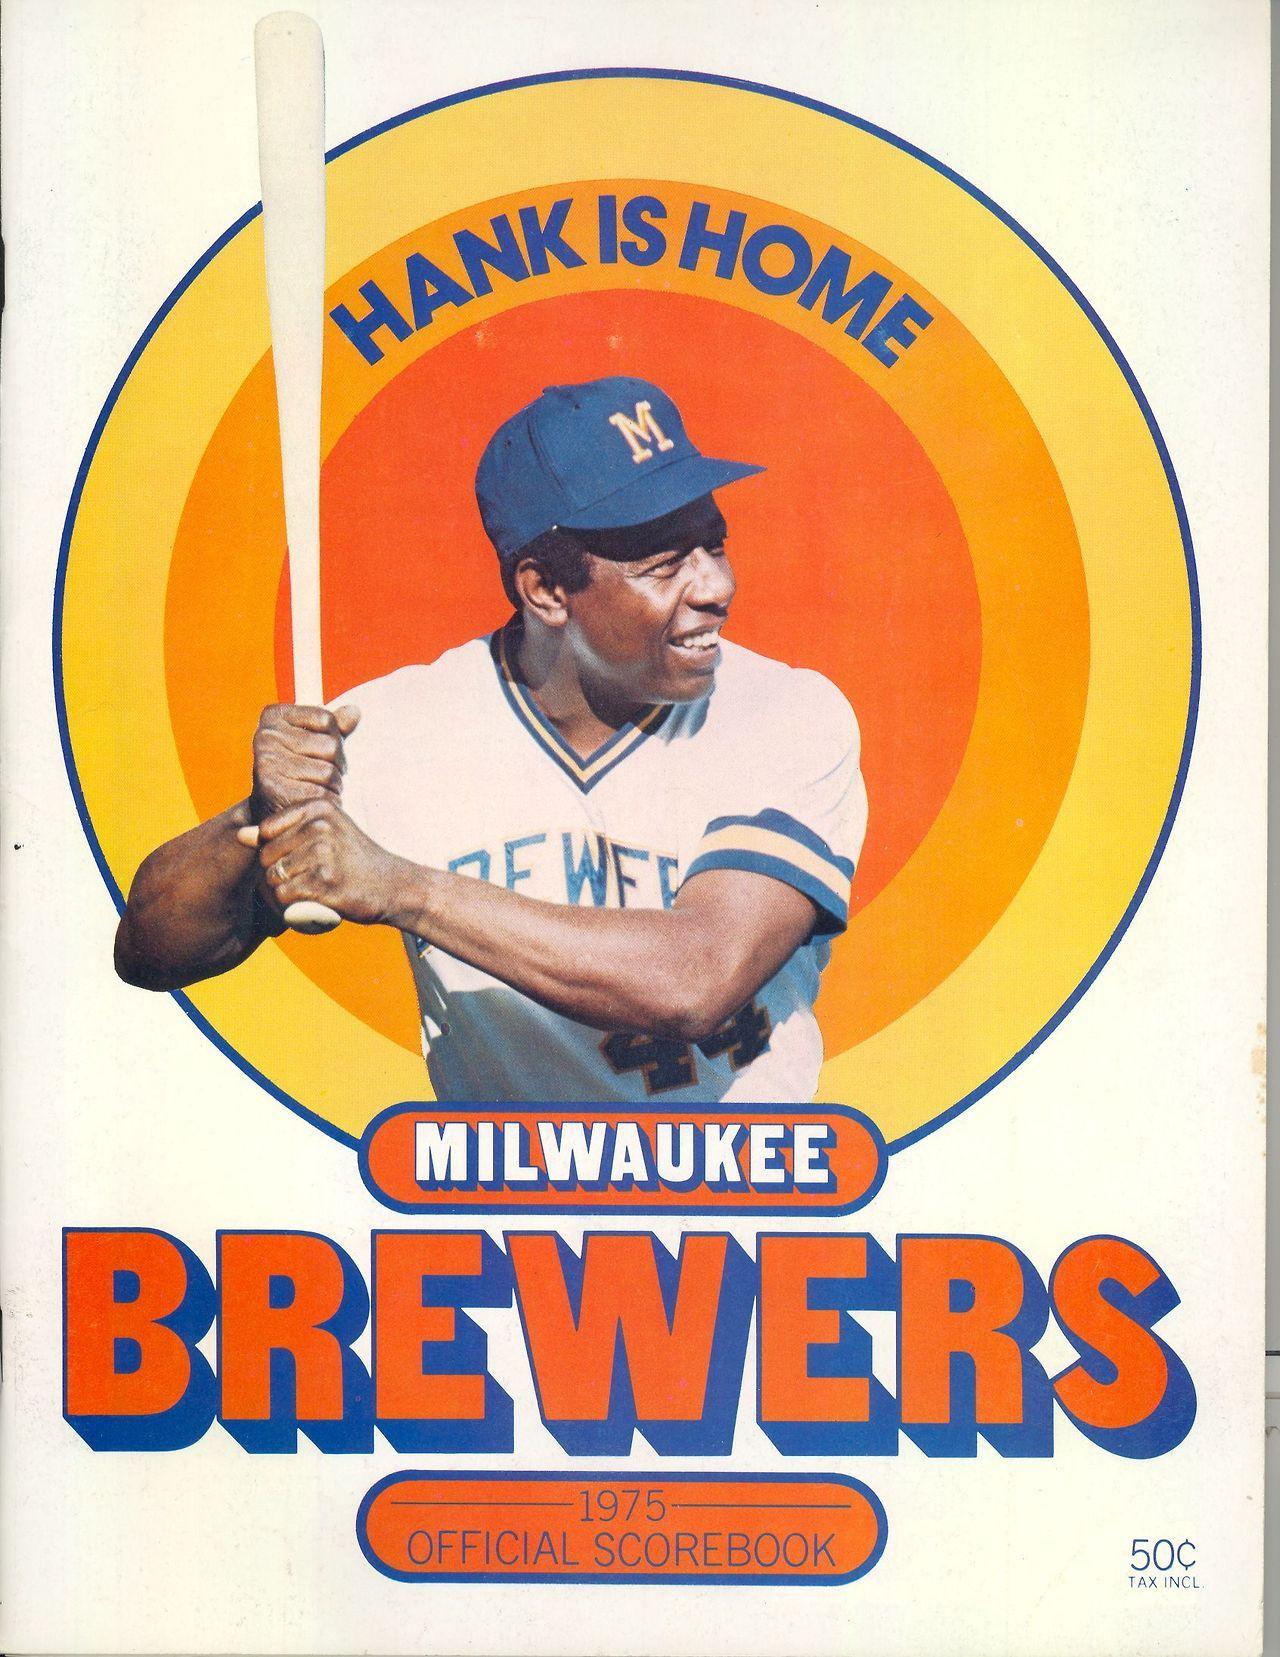 1975 Brewers Milwaukee Brewers Baseball Milwaukee Brewers Brewers Baseball